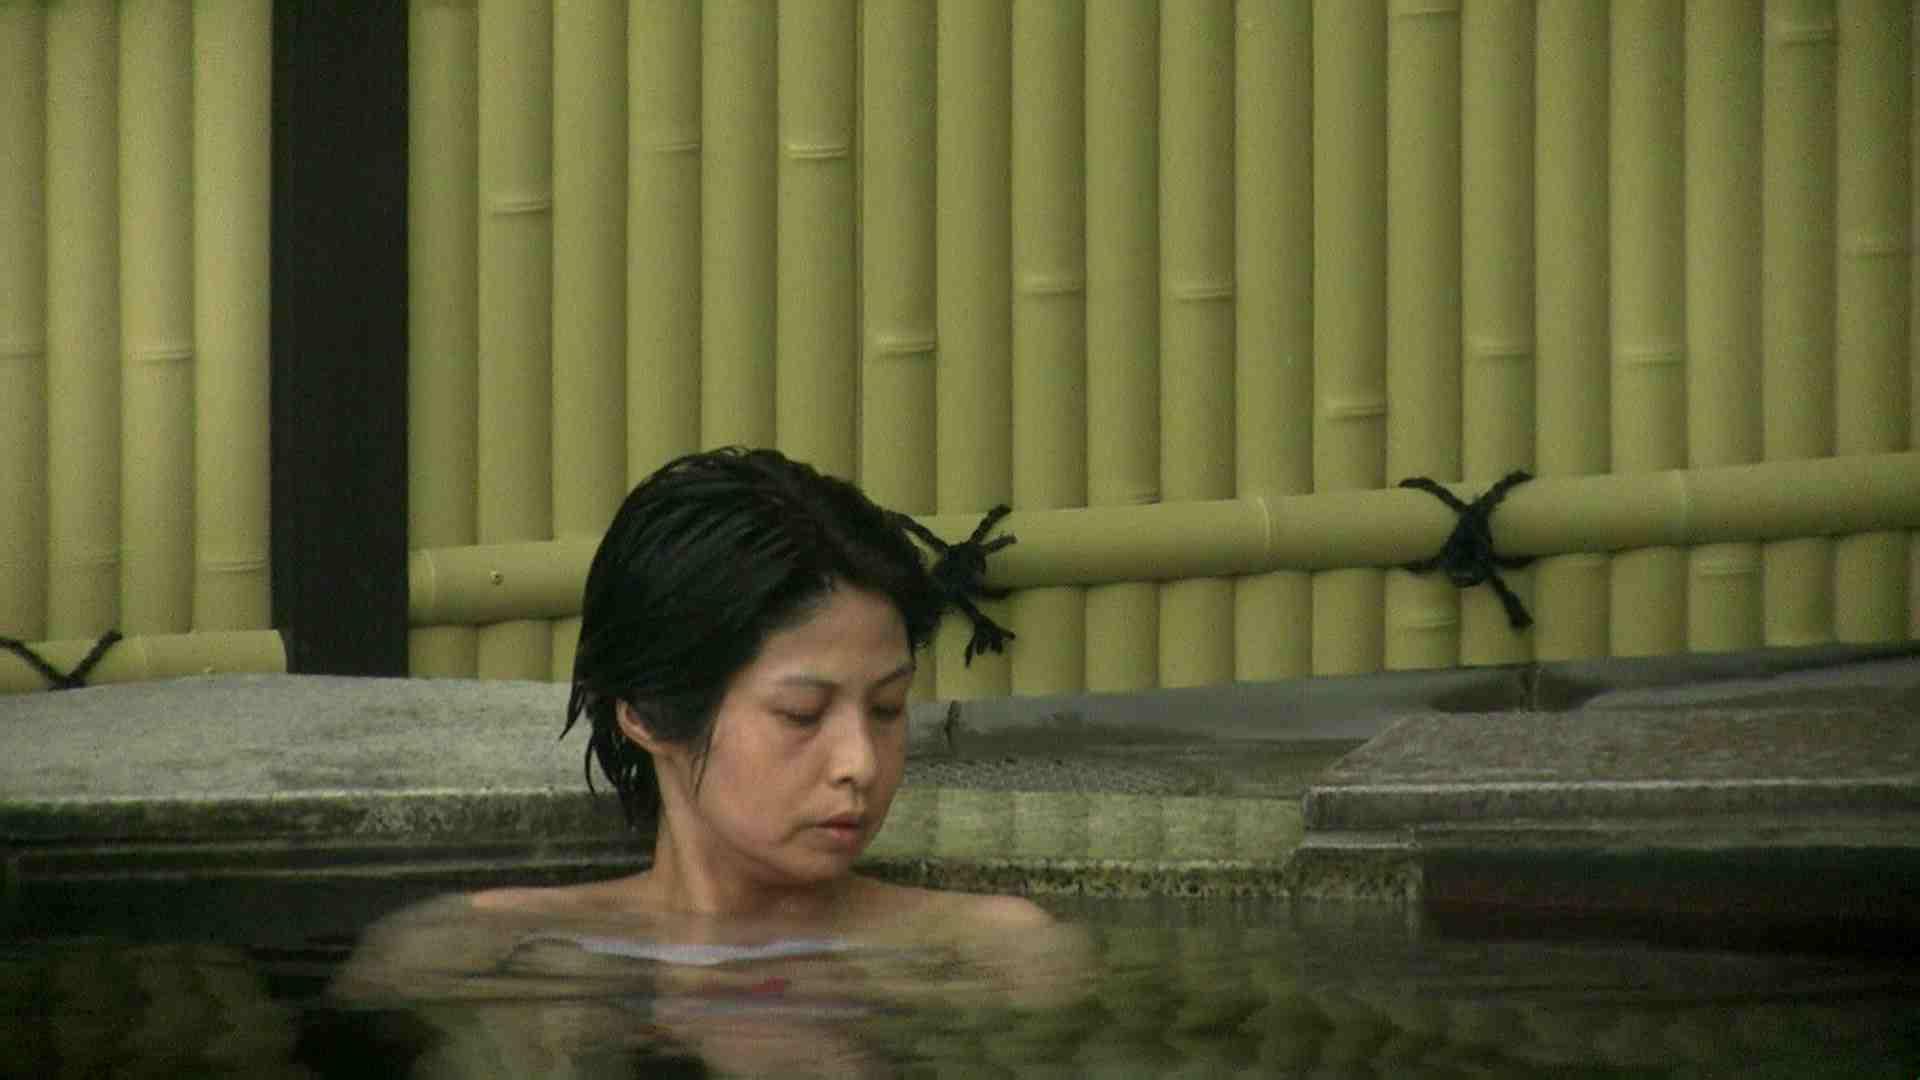 Aquaな露天風呂Vol.636 0 | 0  45連発 3